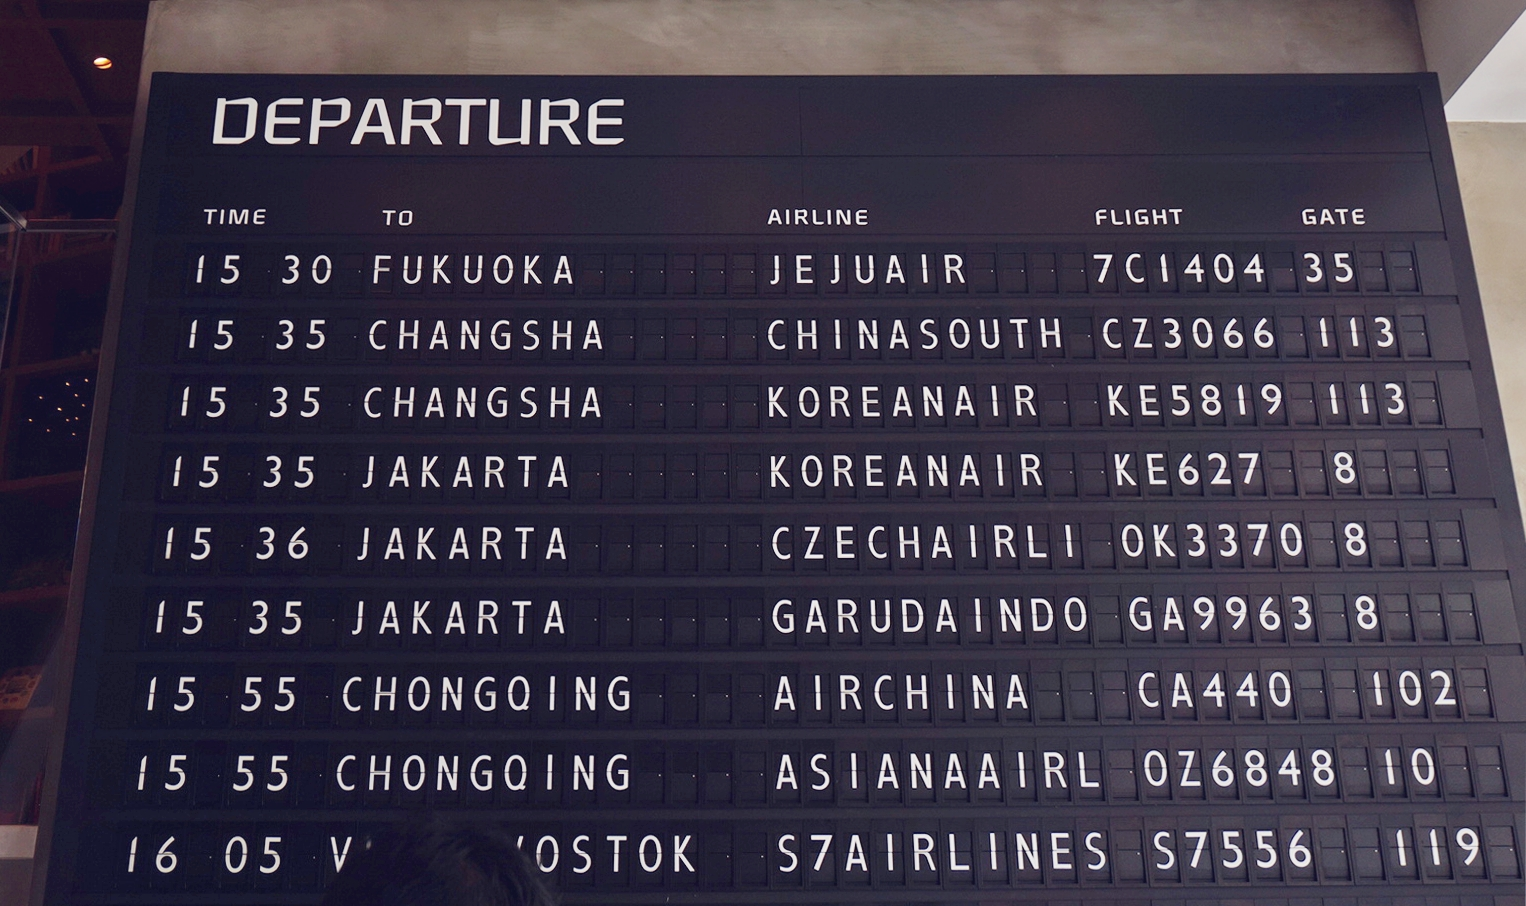 SEL? GMP? ICN? 도시코드는 뭐고 공항코드는 뭐지?